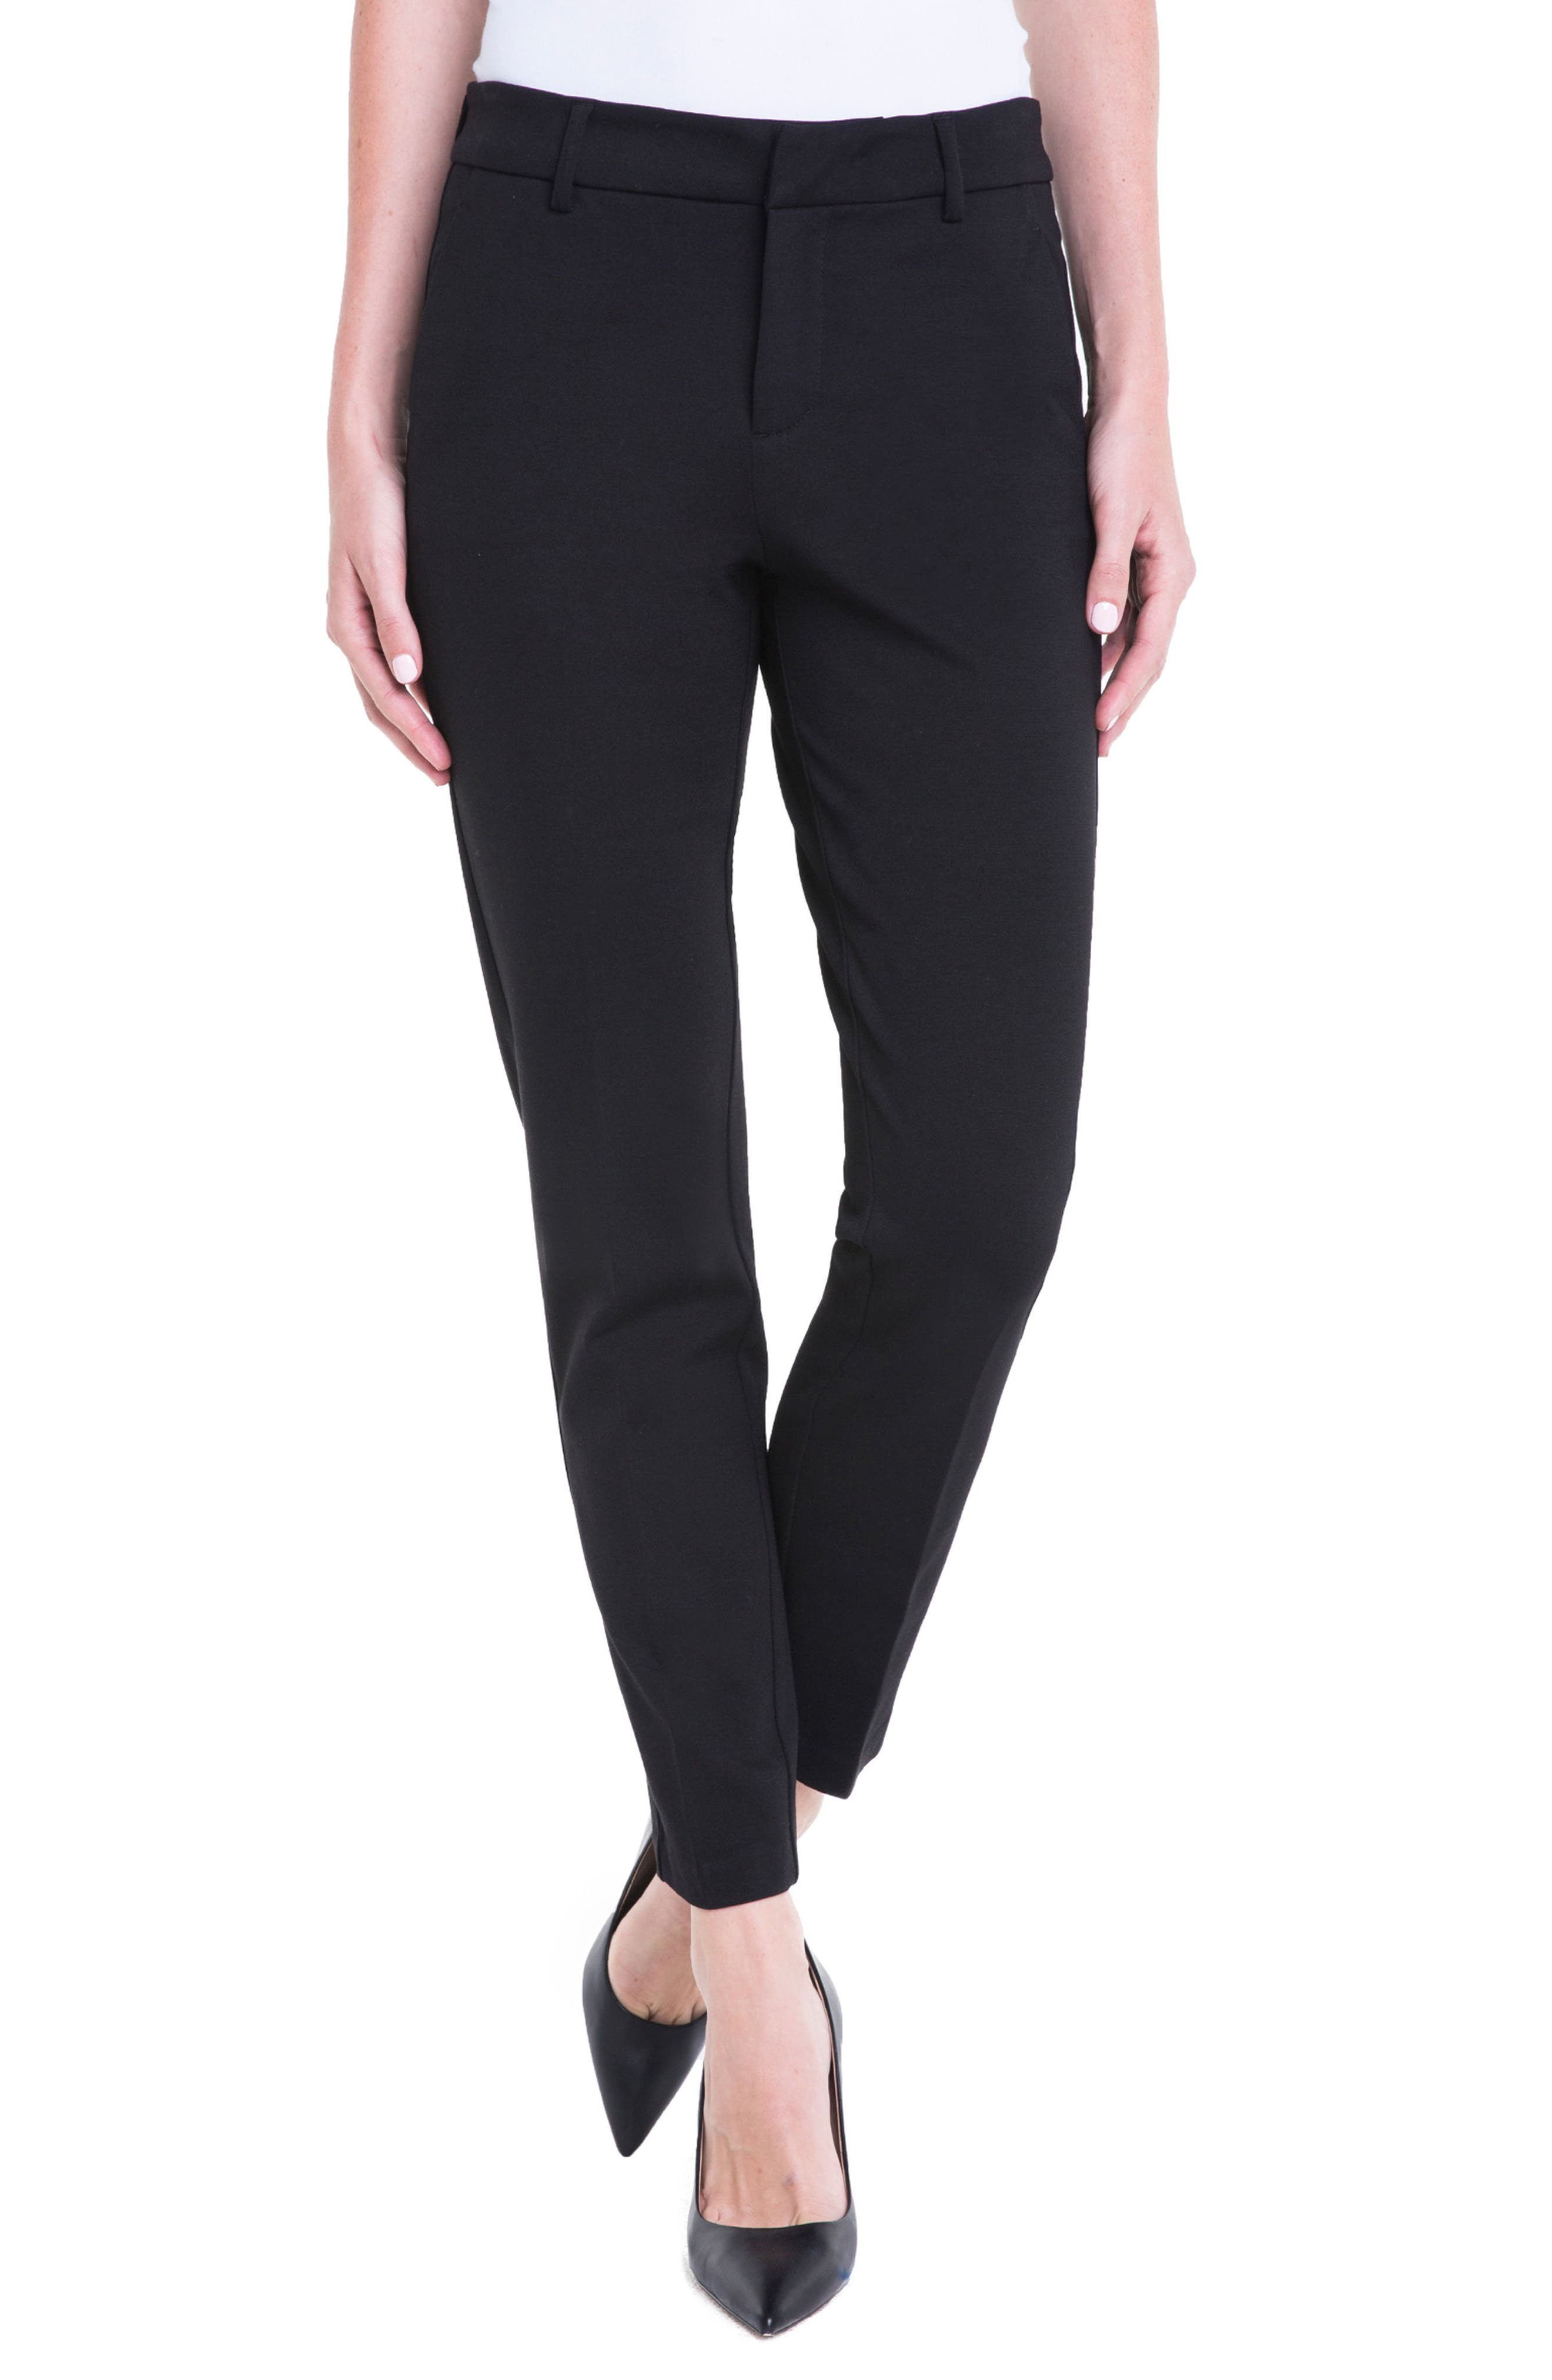 Kelsey Knit Trousers,                             Main thumbnail 1, color,                             BLACK